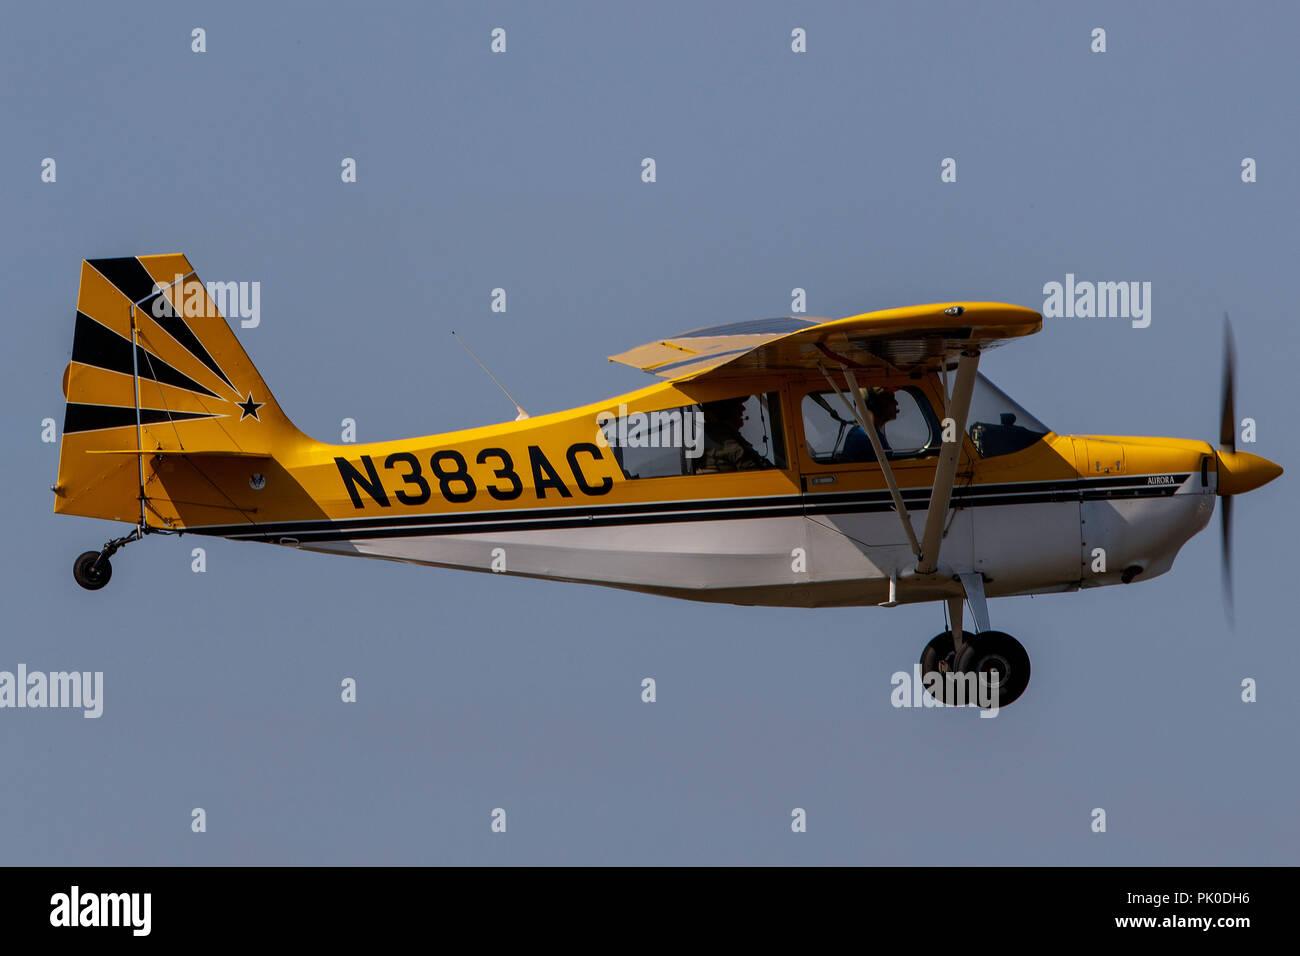 American Champion Aircraft Citabria 7ECA (N383AC) on approach to Palo Alto Airport (KPAO), Palo Alto, California, United States of America - Stock Image